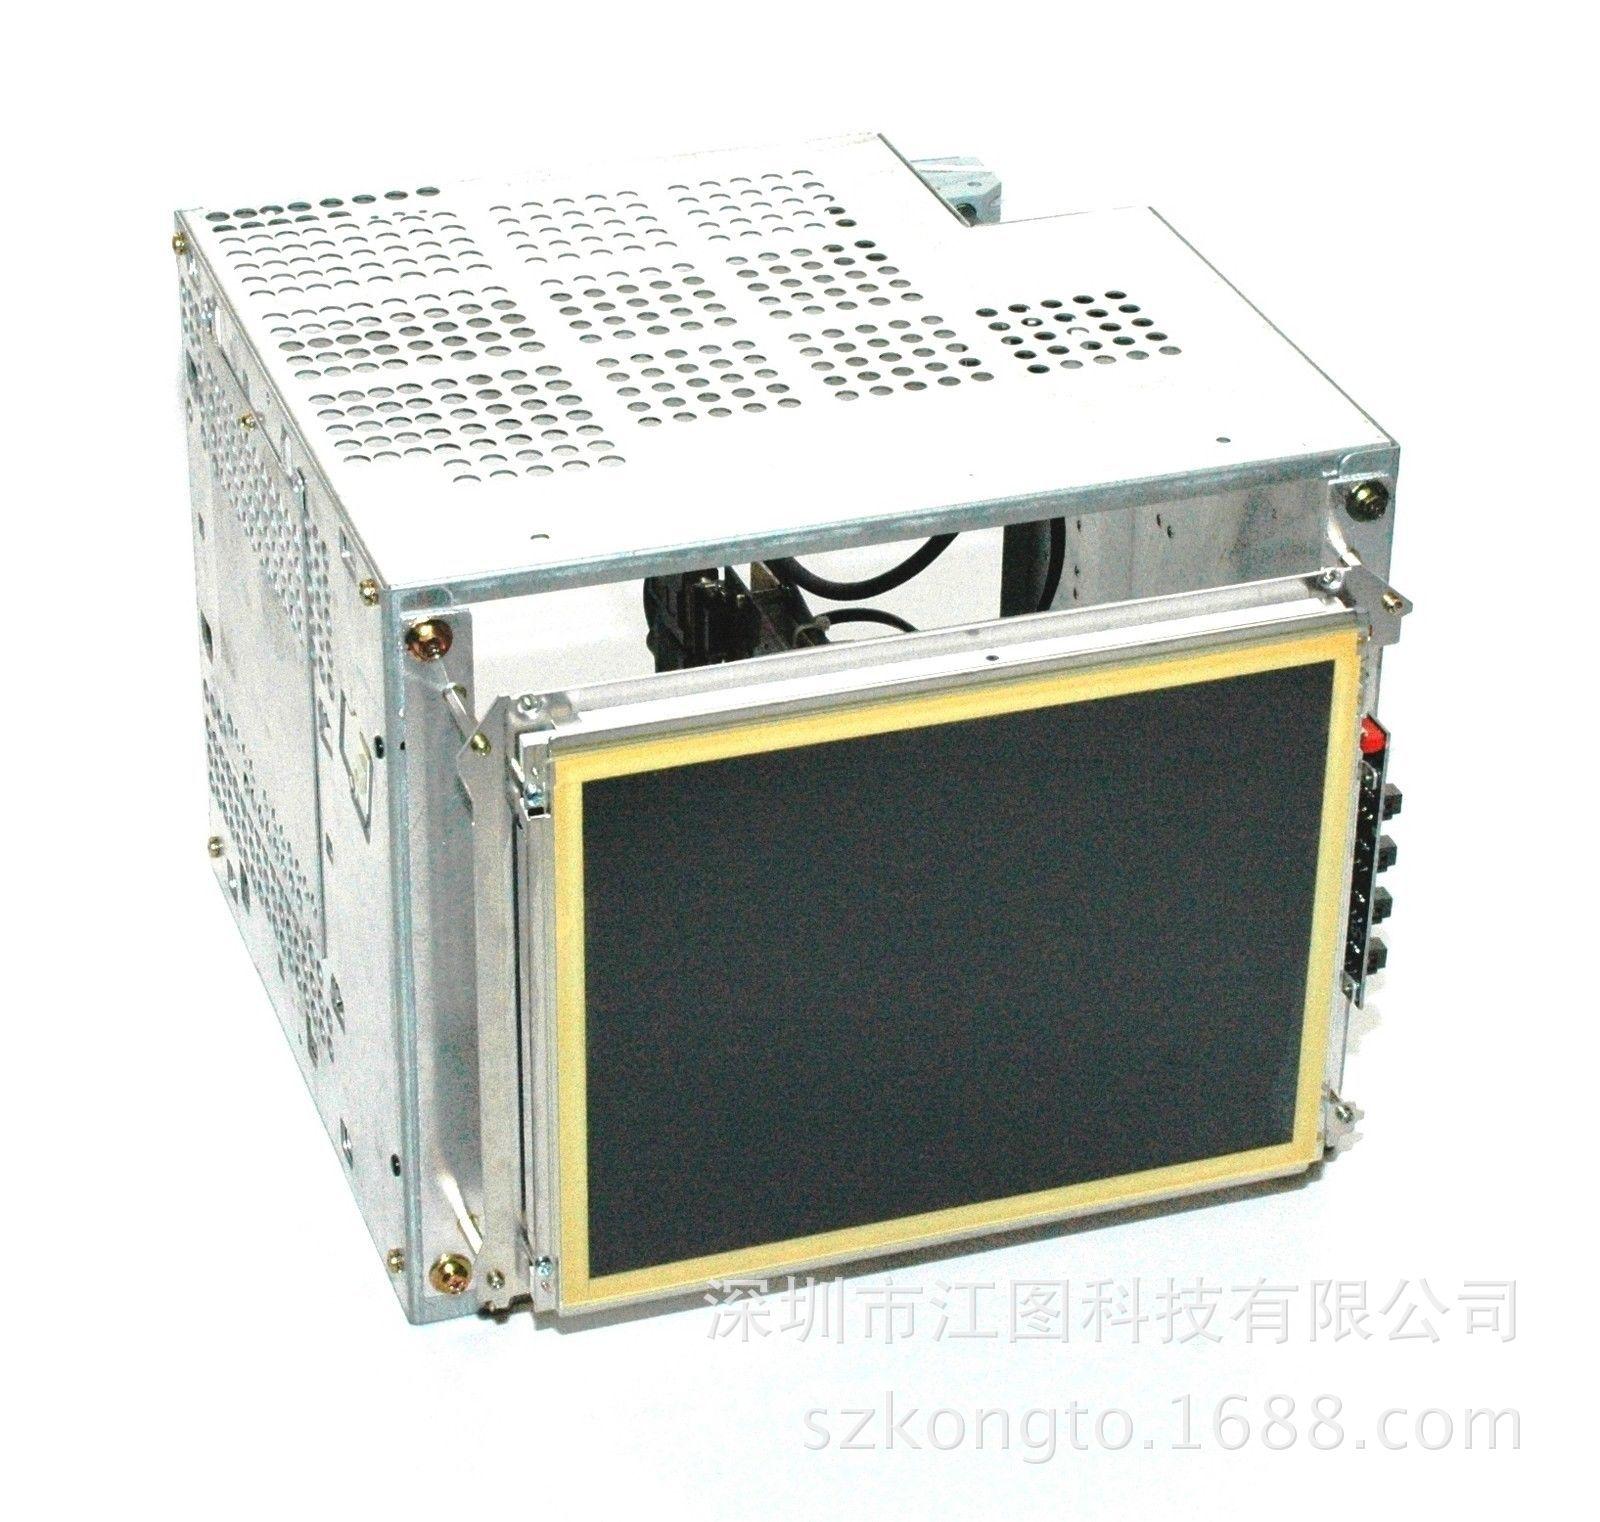 MatsushitaTX-1450ABA5A61L-0001-0094 # A الصناعية شاشات الكريستال السائل